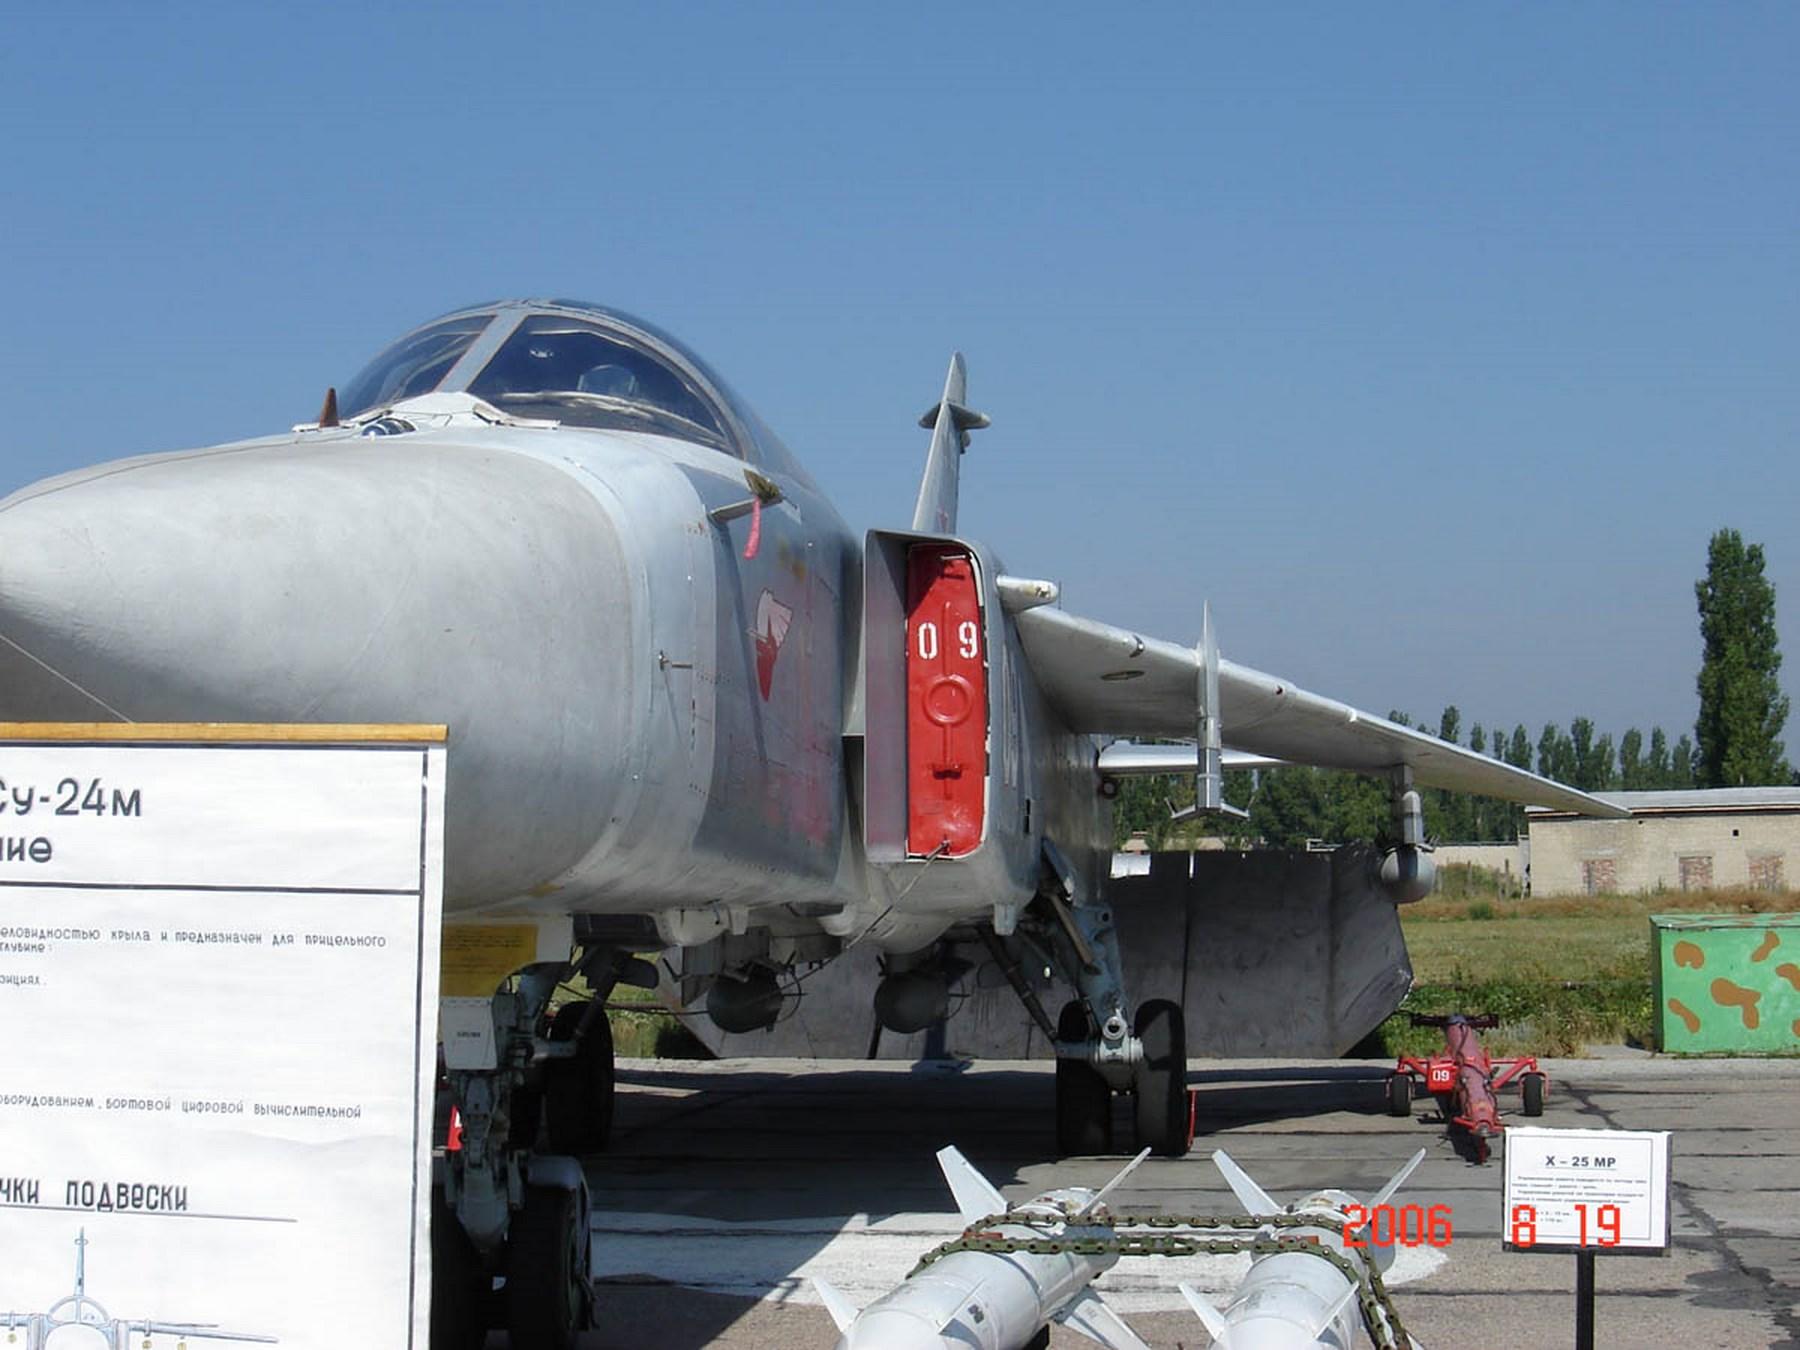 Sukhoi Su-24М Fechter